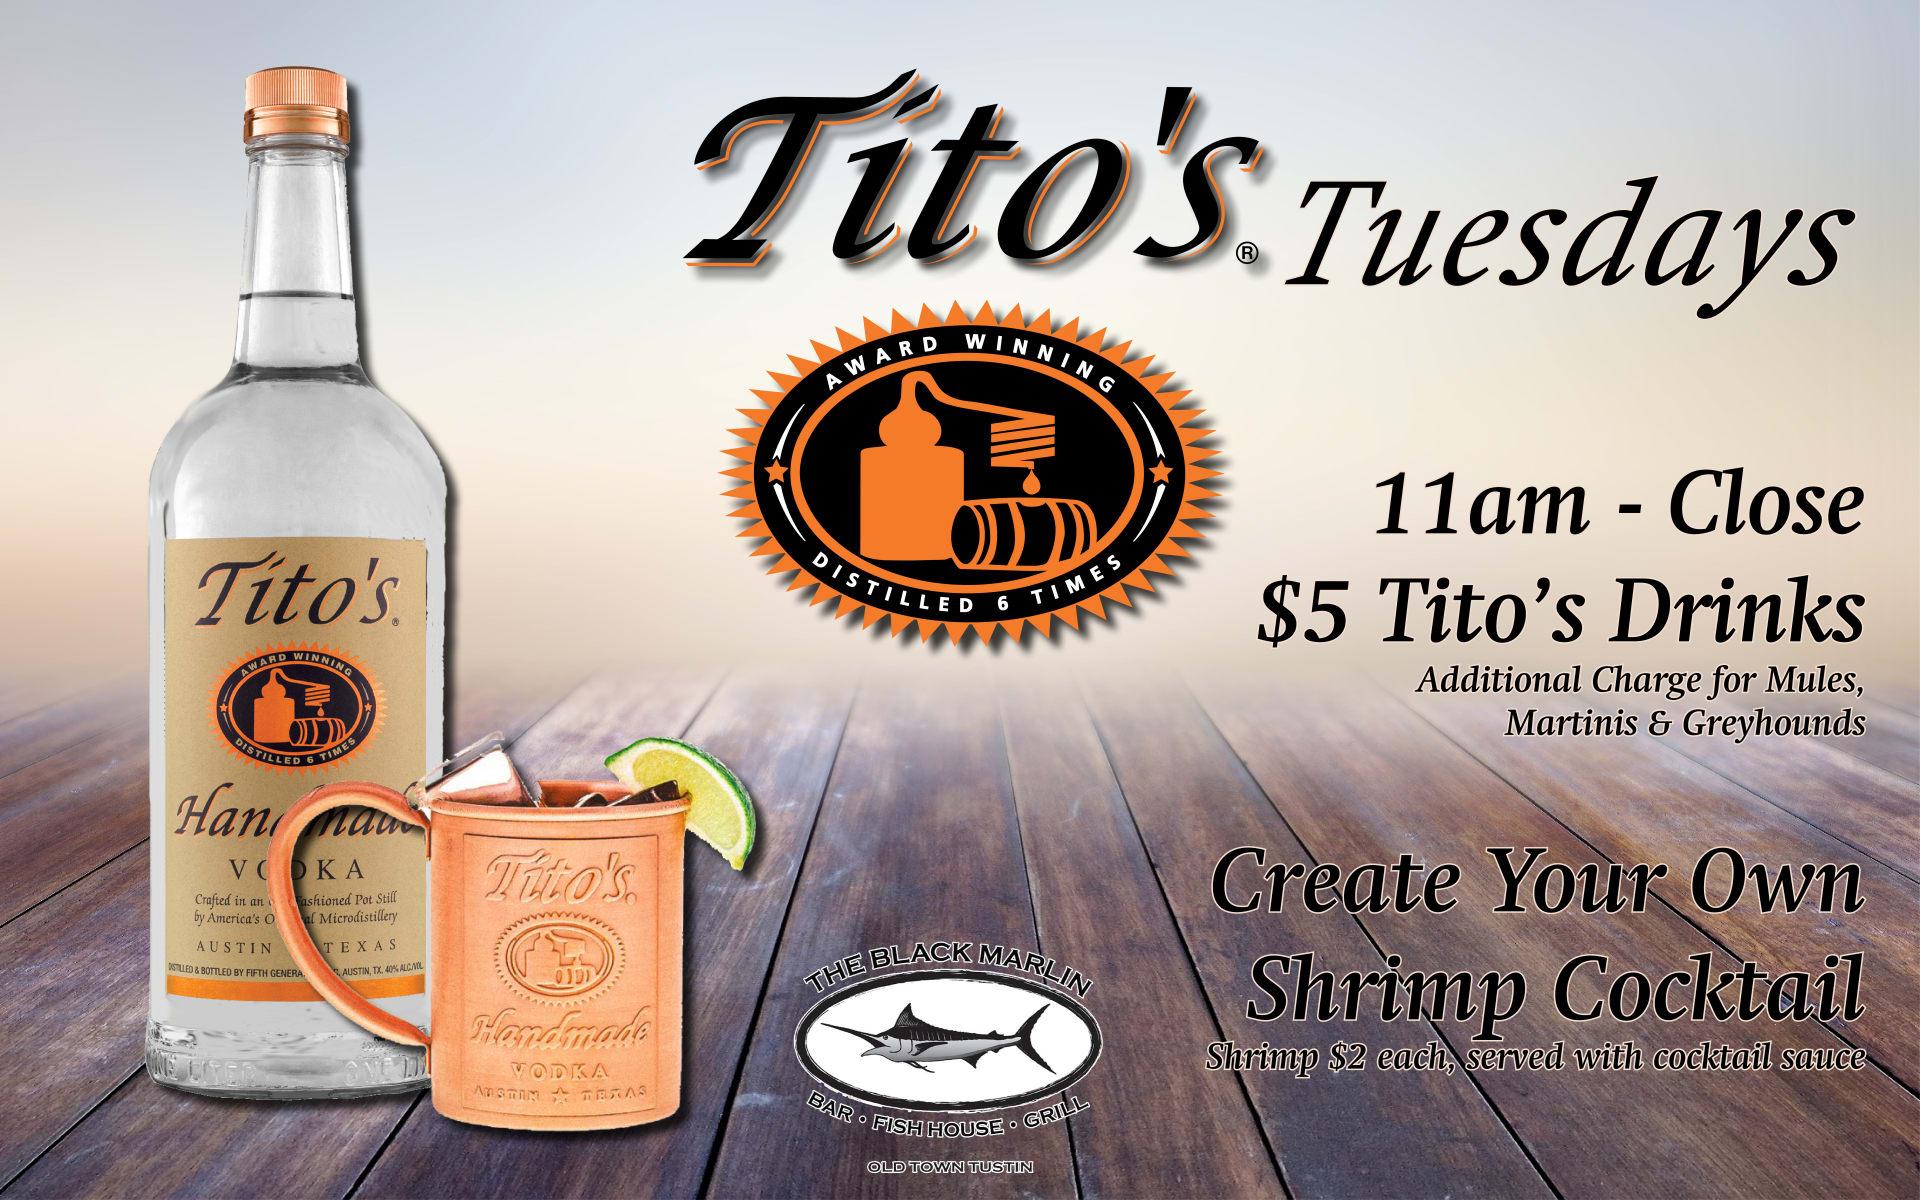 Tito's Tuesdays